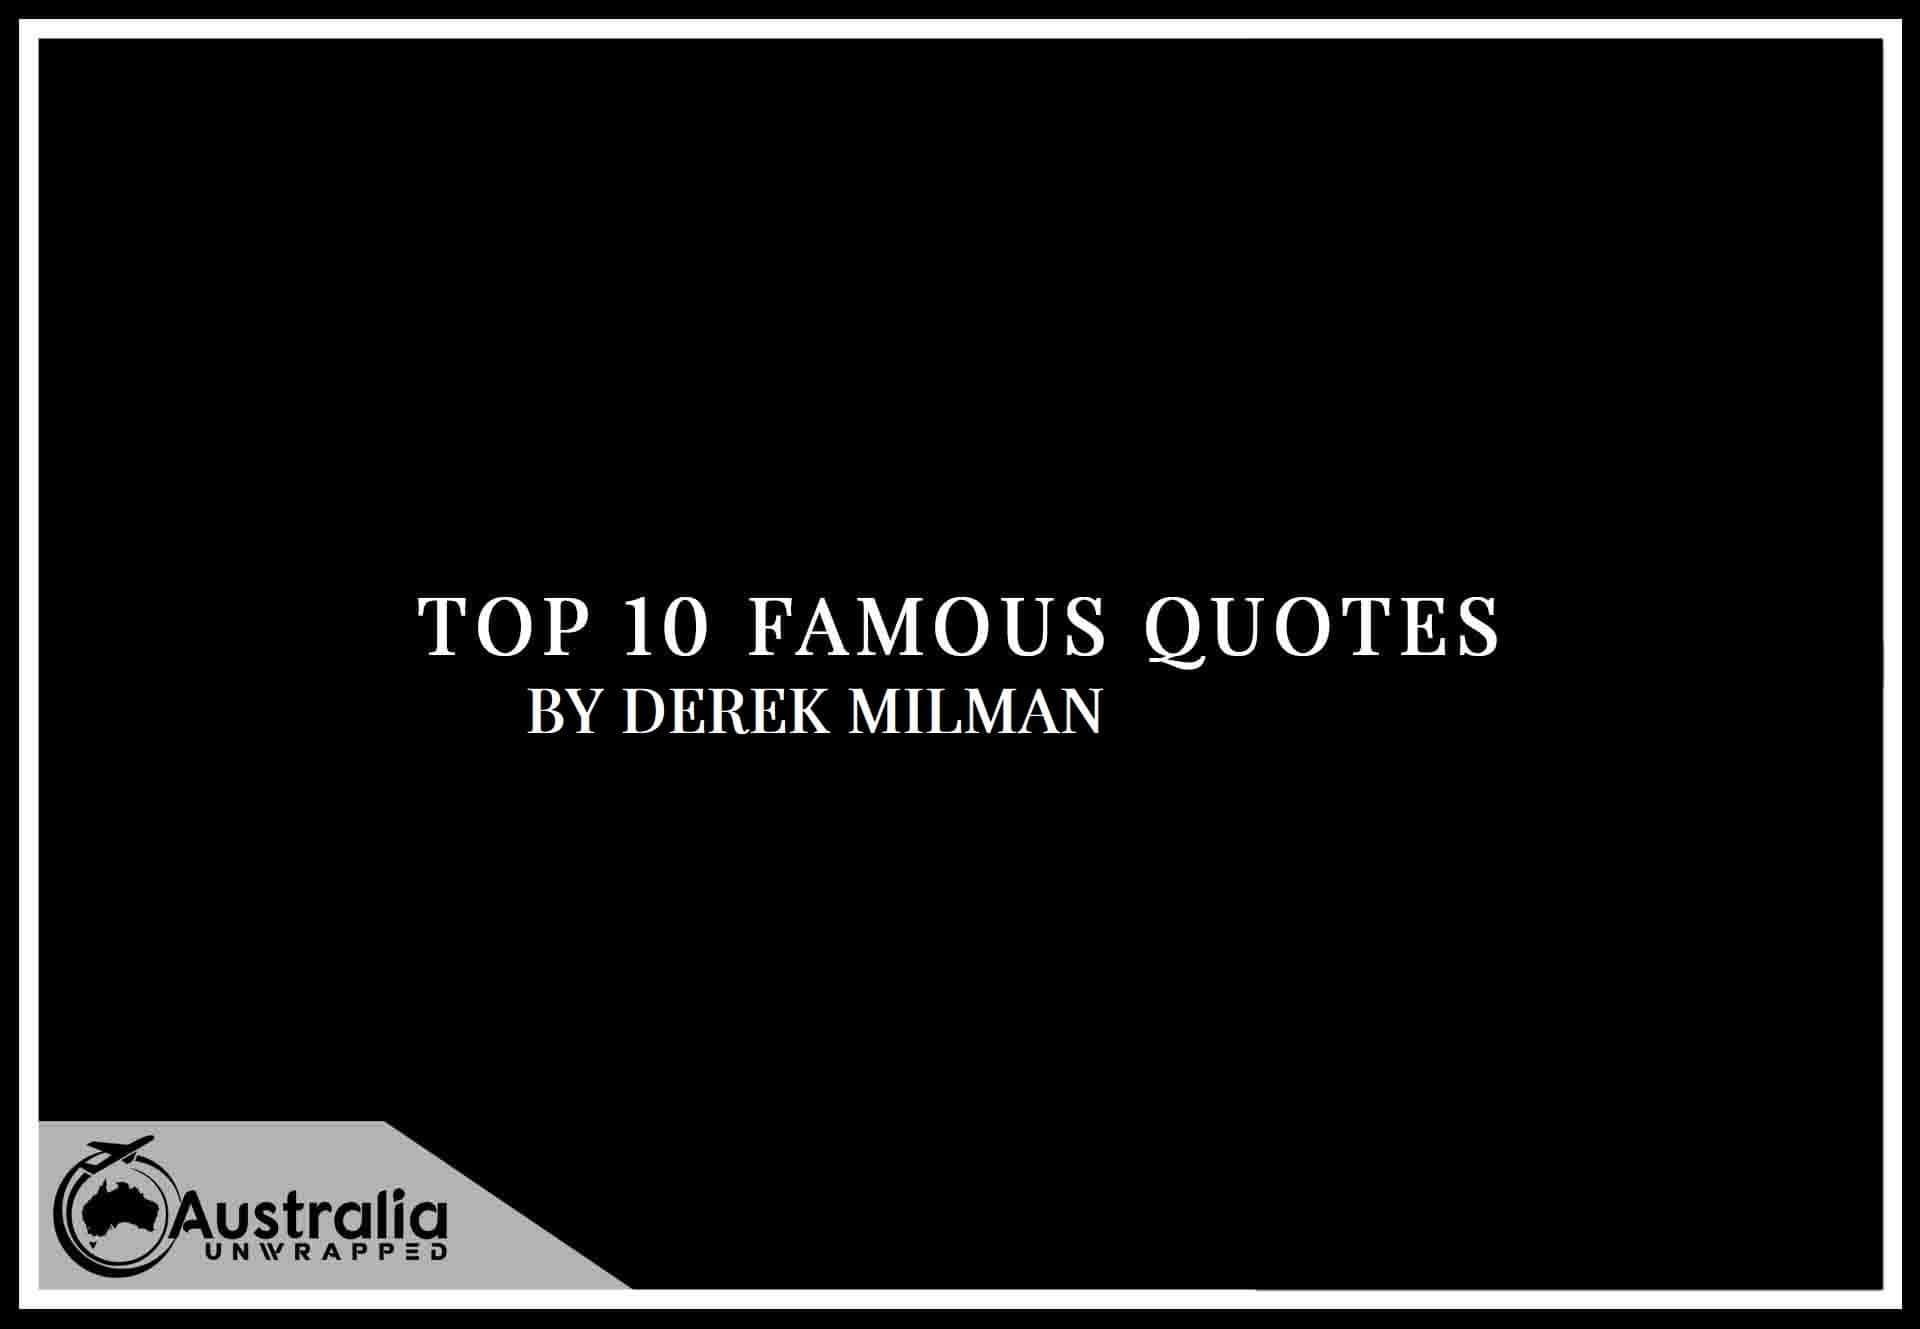 Top 10 Famous Quotes by Author Derek Milman